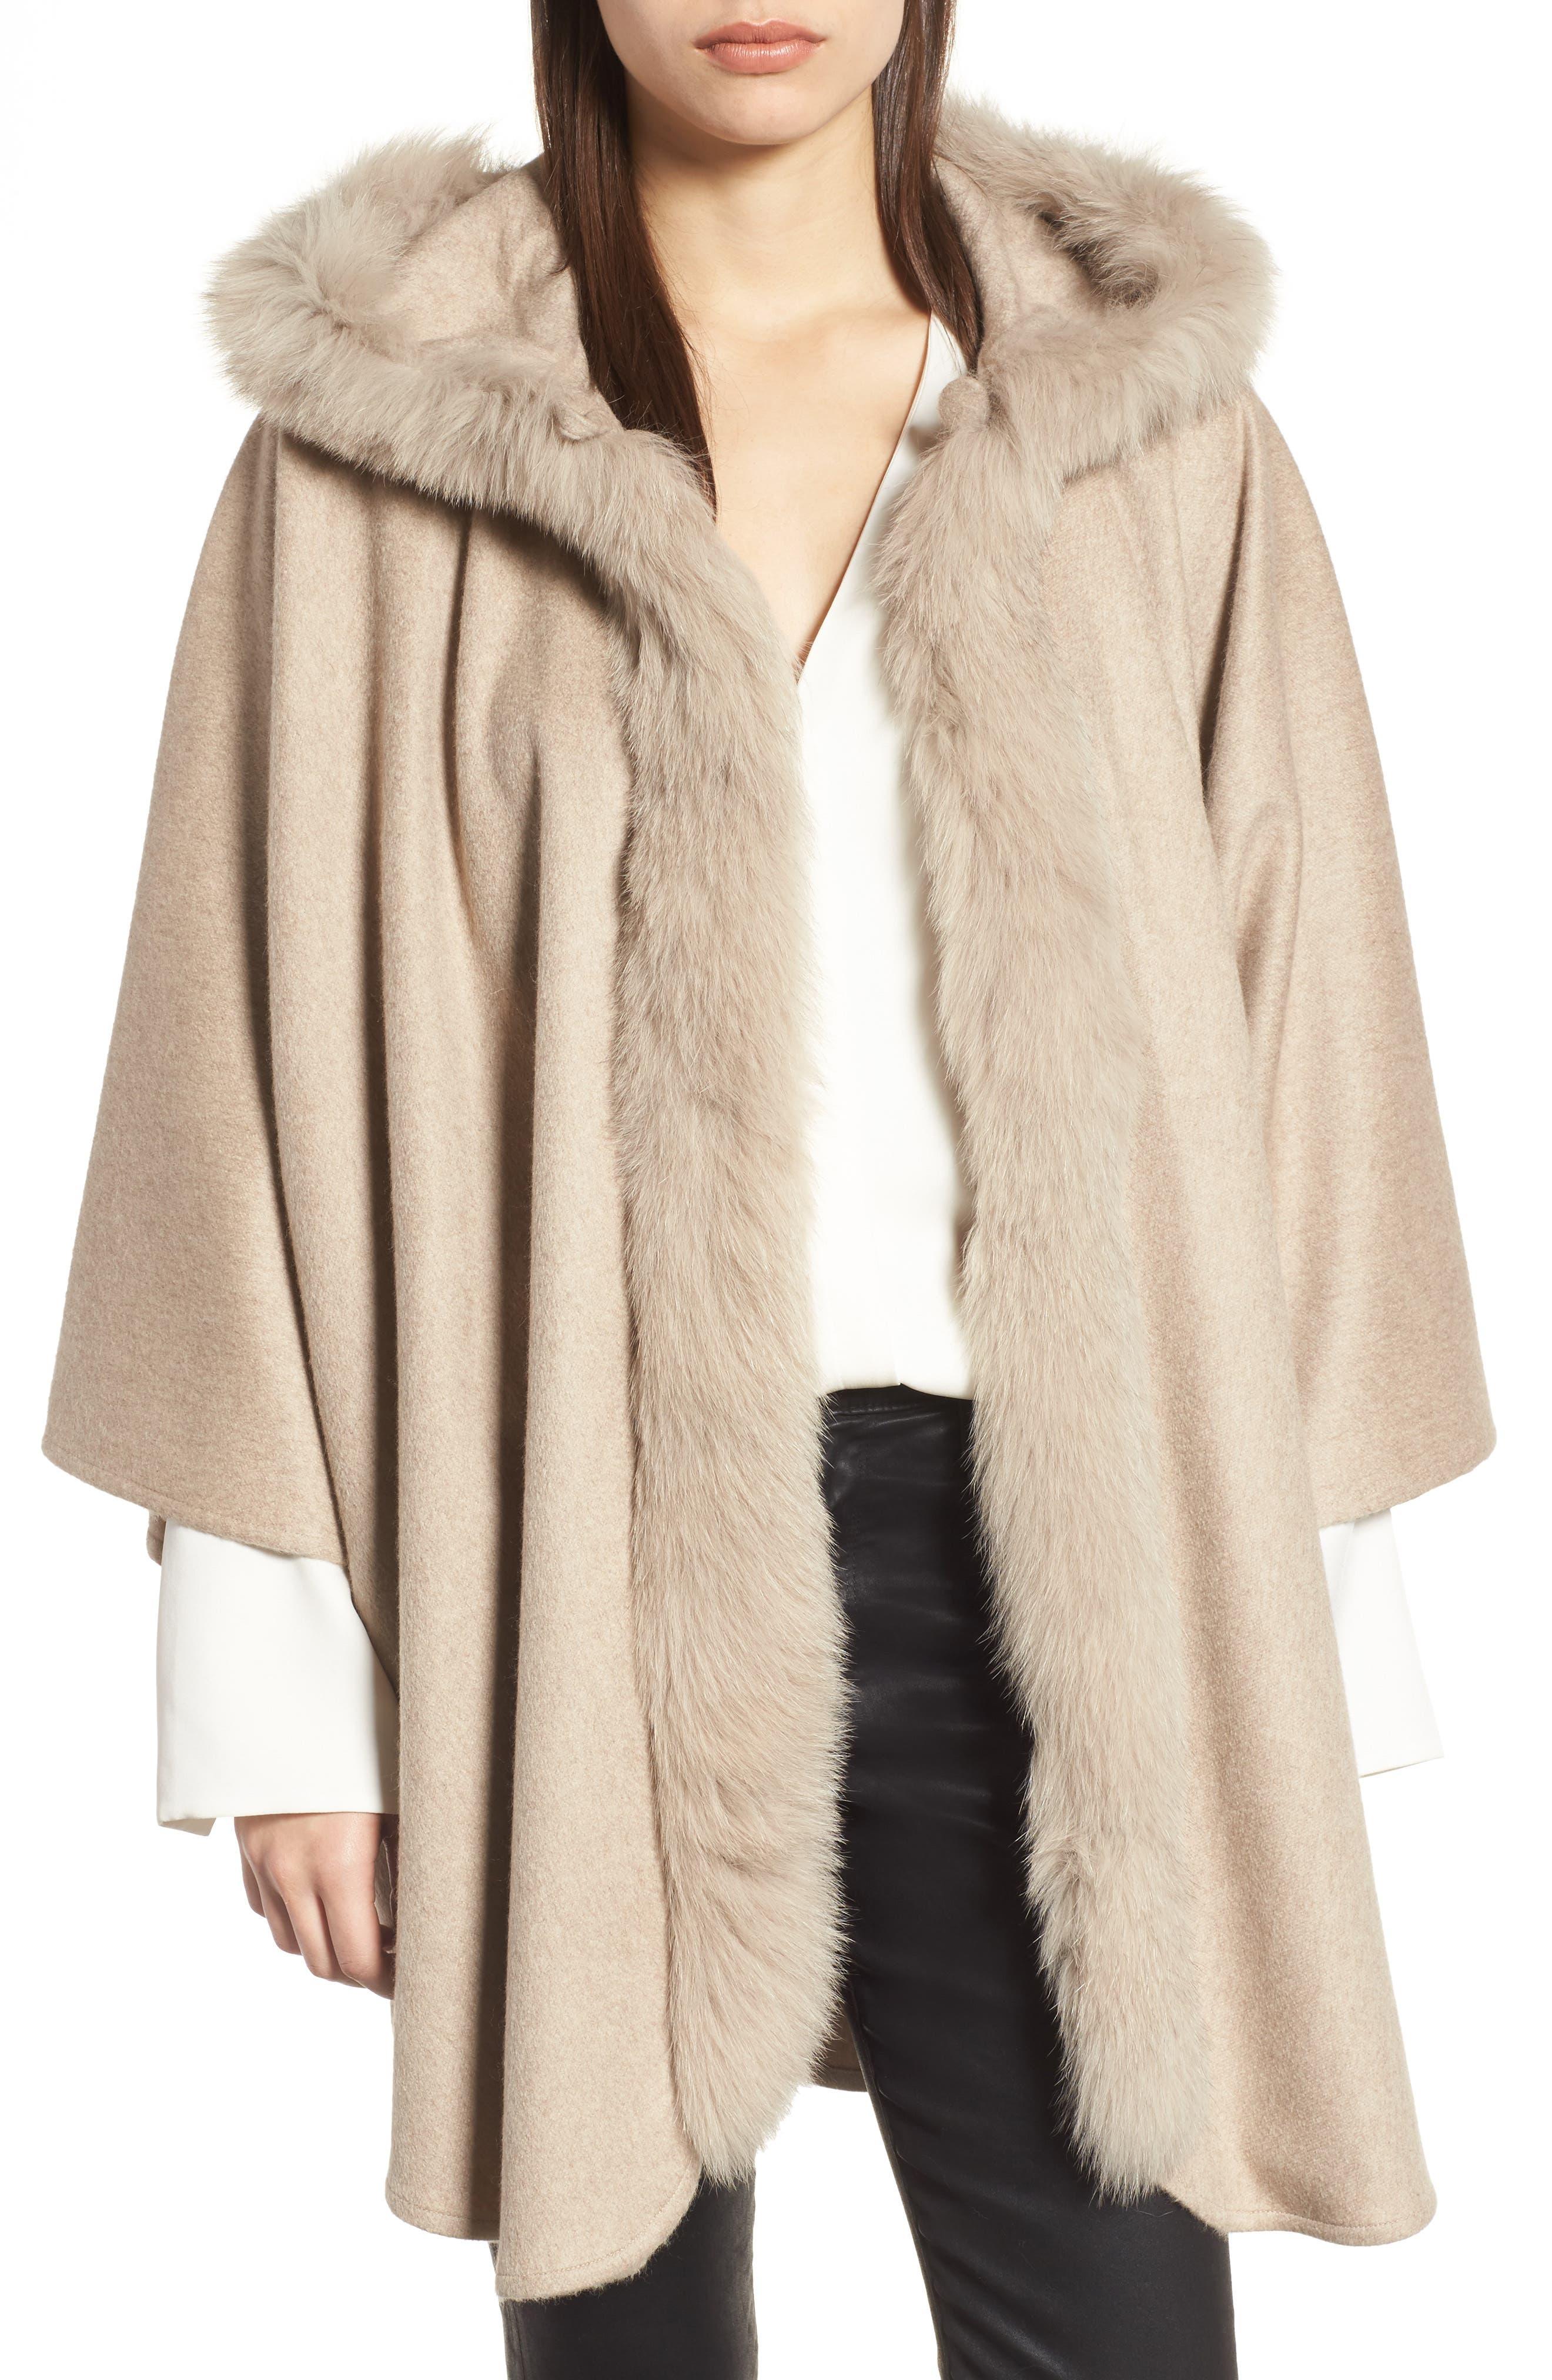 Cashmere Hooded Cape with Genuine Fox Fur Trim,                         Main,                         color, 020